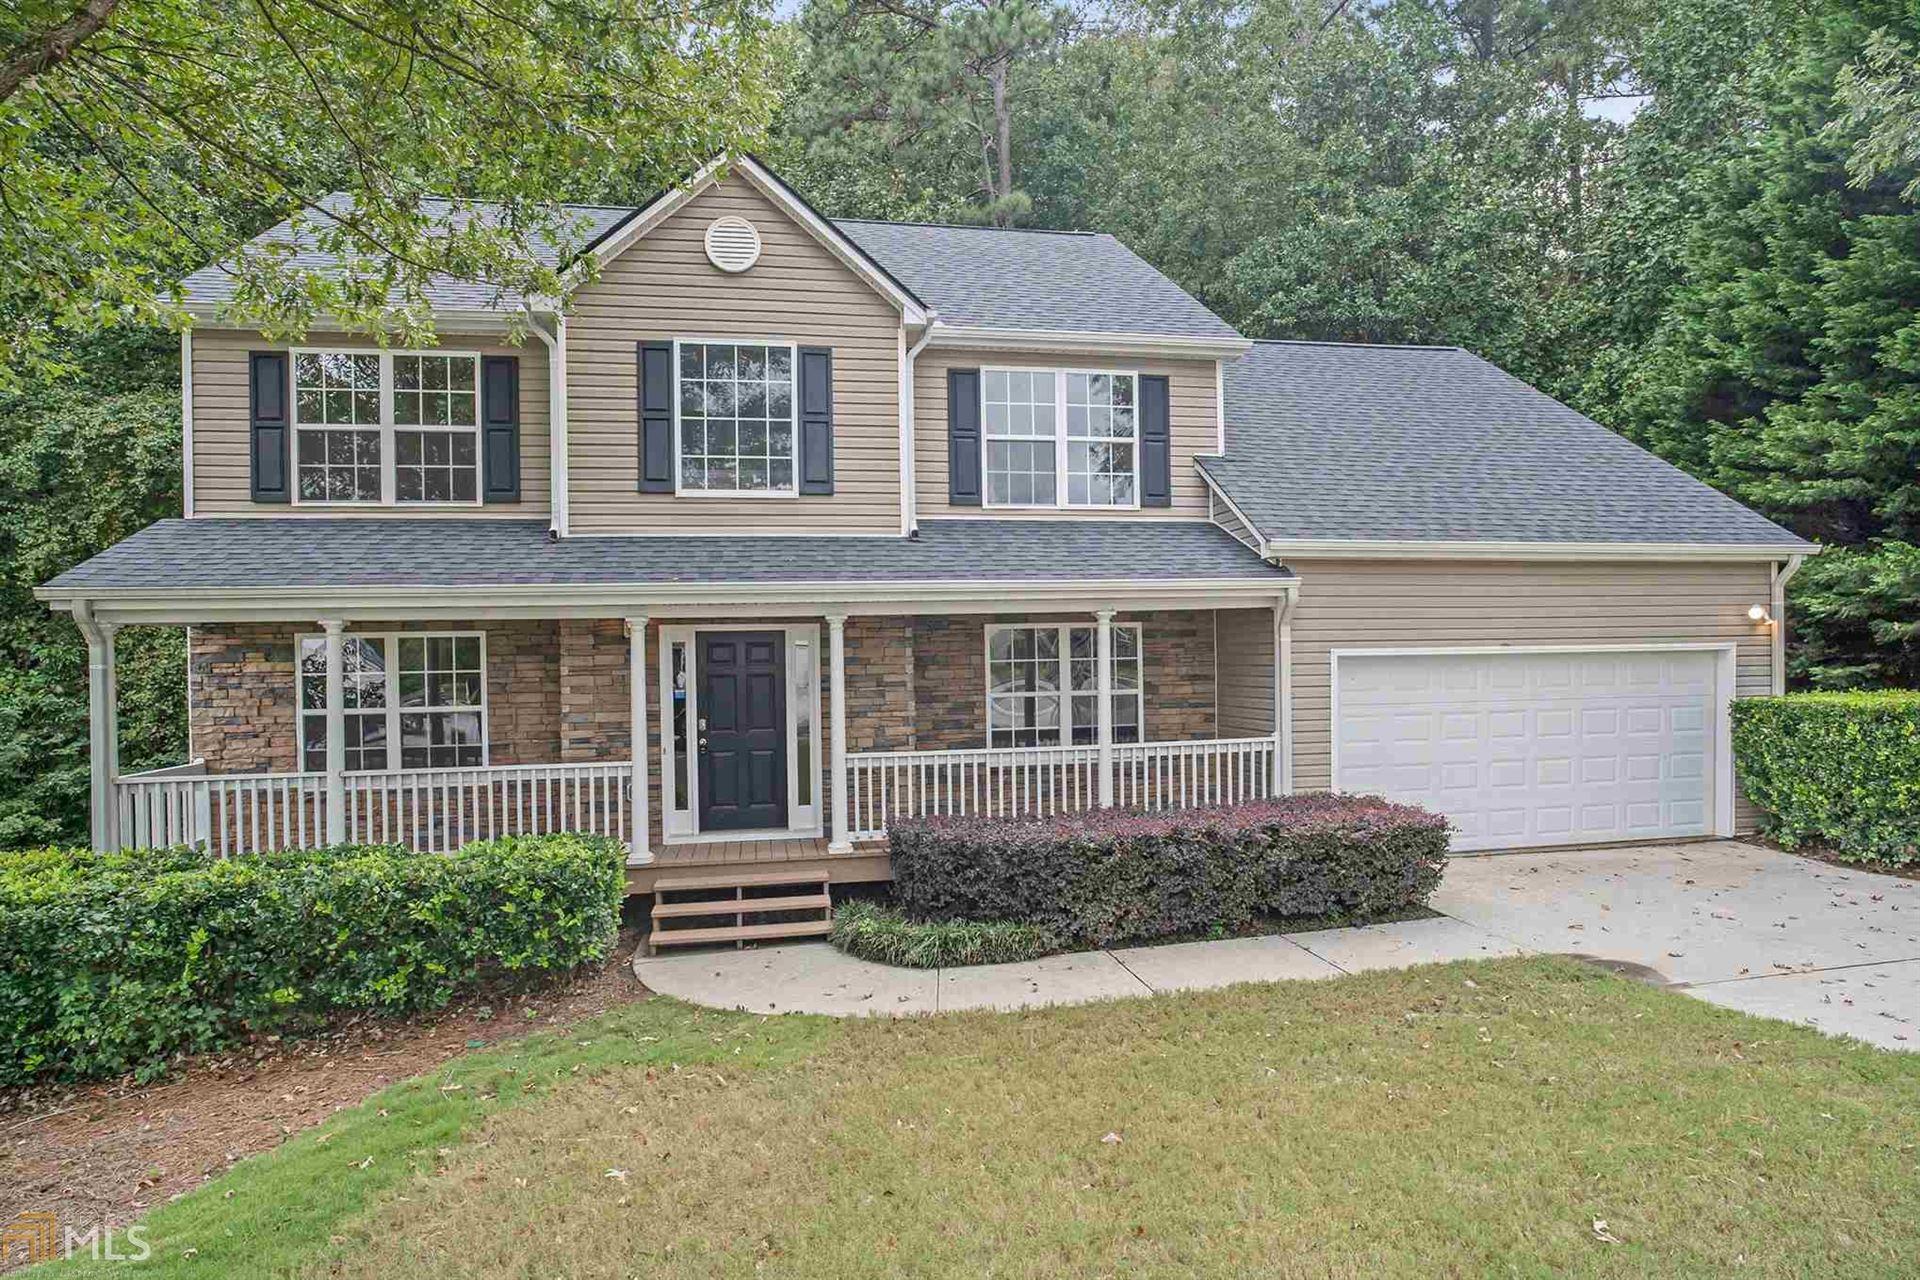 1375 Webb Meadows, Loganville, GA 30052 - MLS#: 8864702